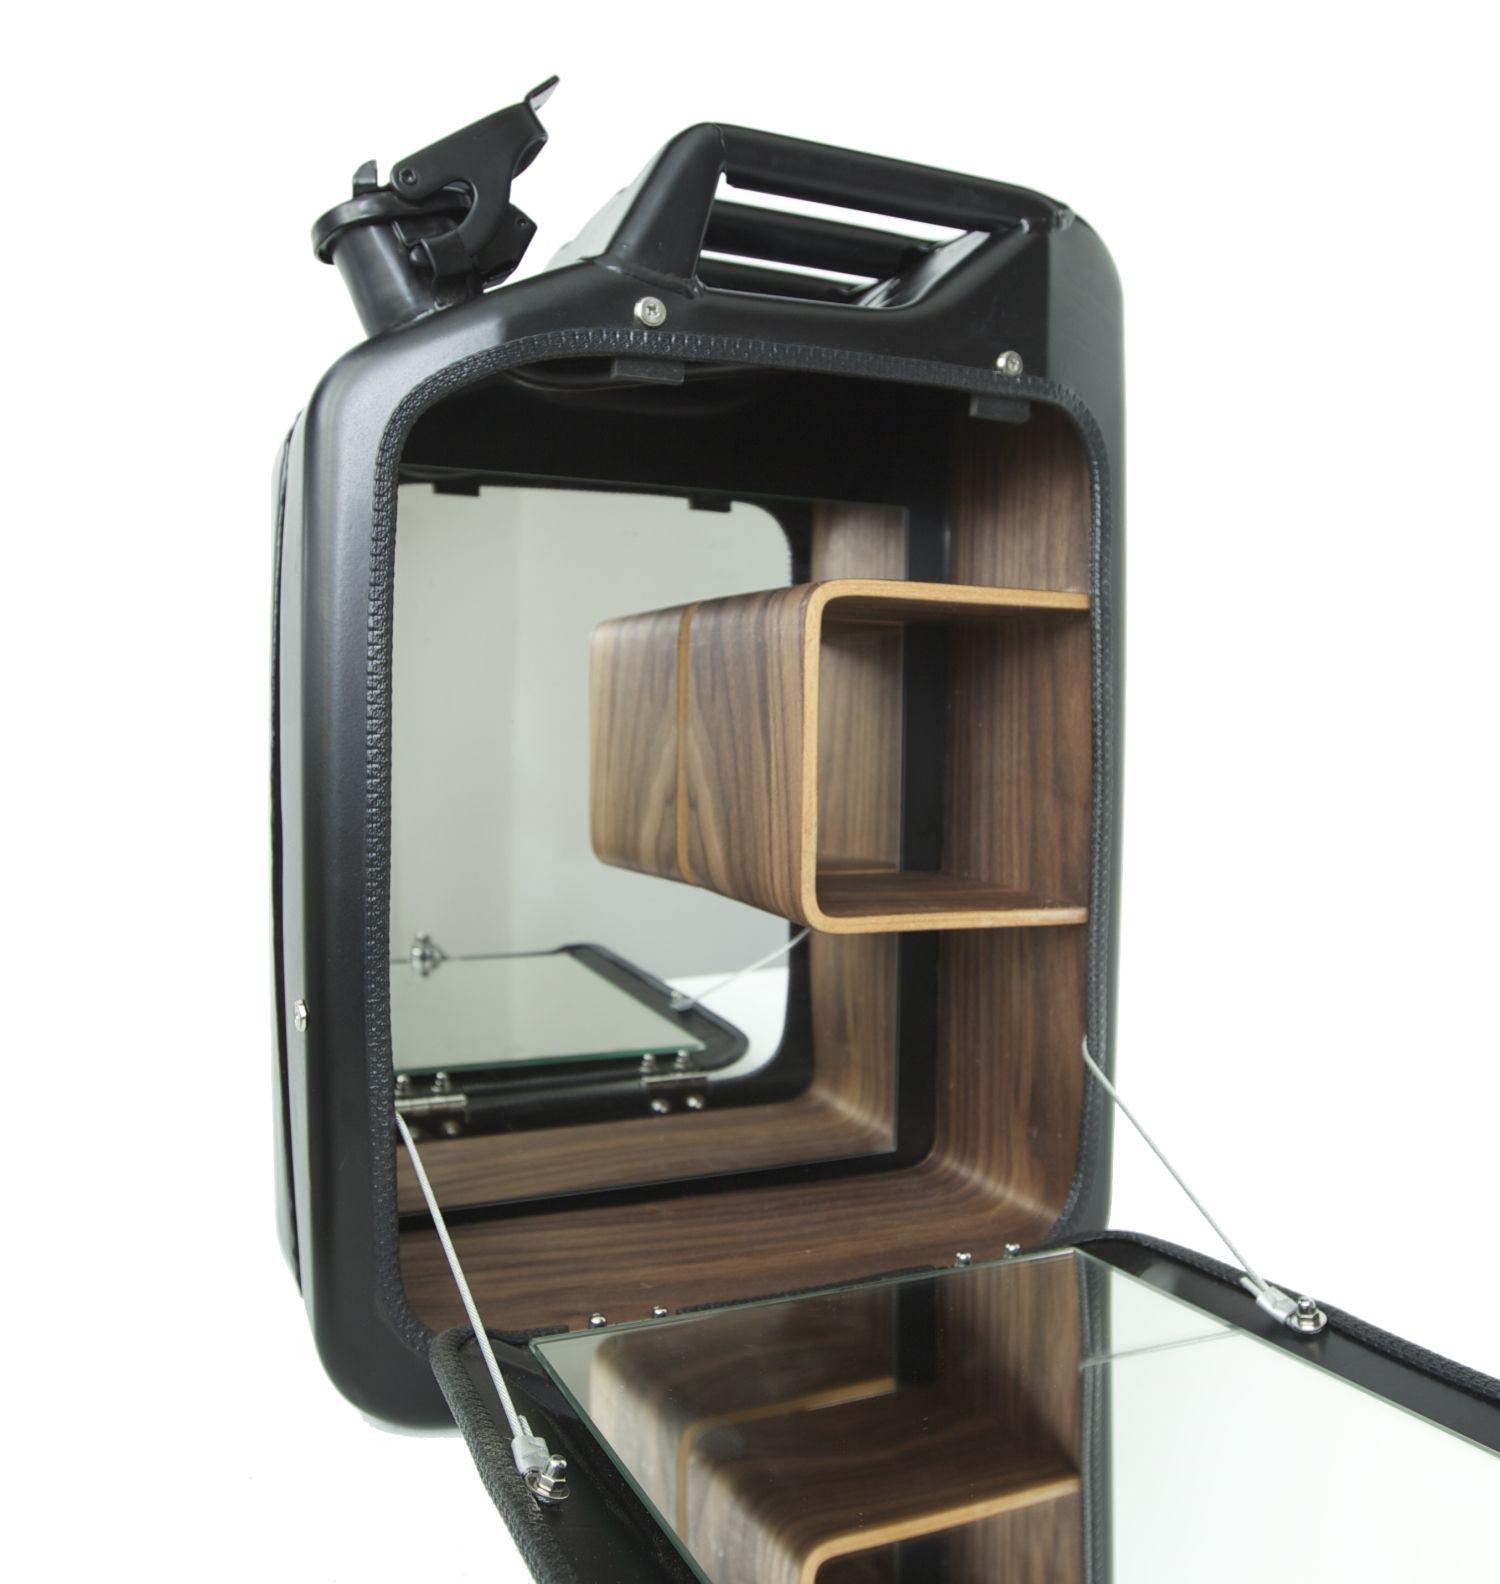 Minibar | Gasoline tank | Pinterest | Danish and Apartments